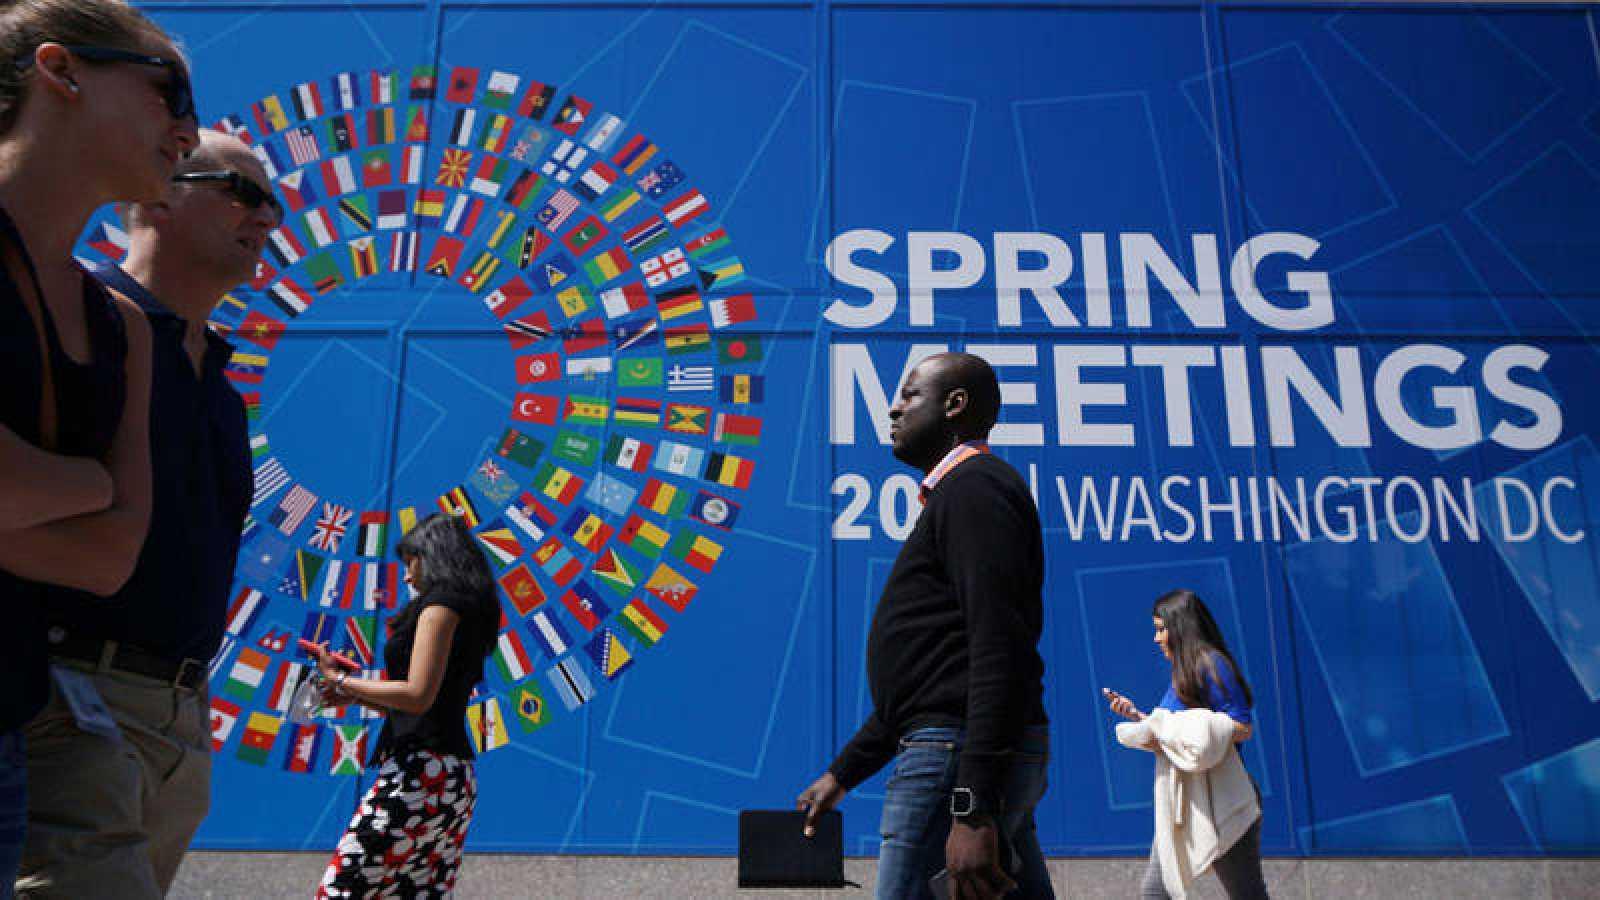 El FMI celebra su asamblea de primavera en Washington